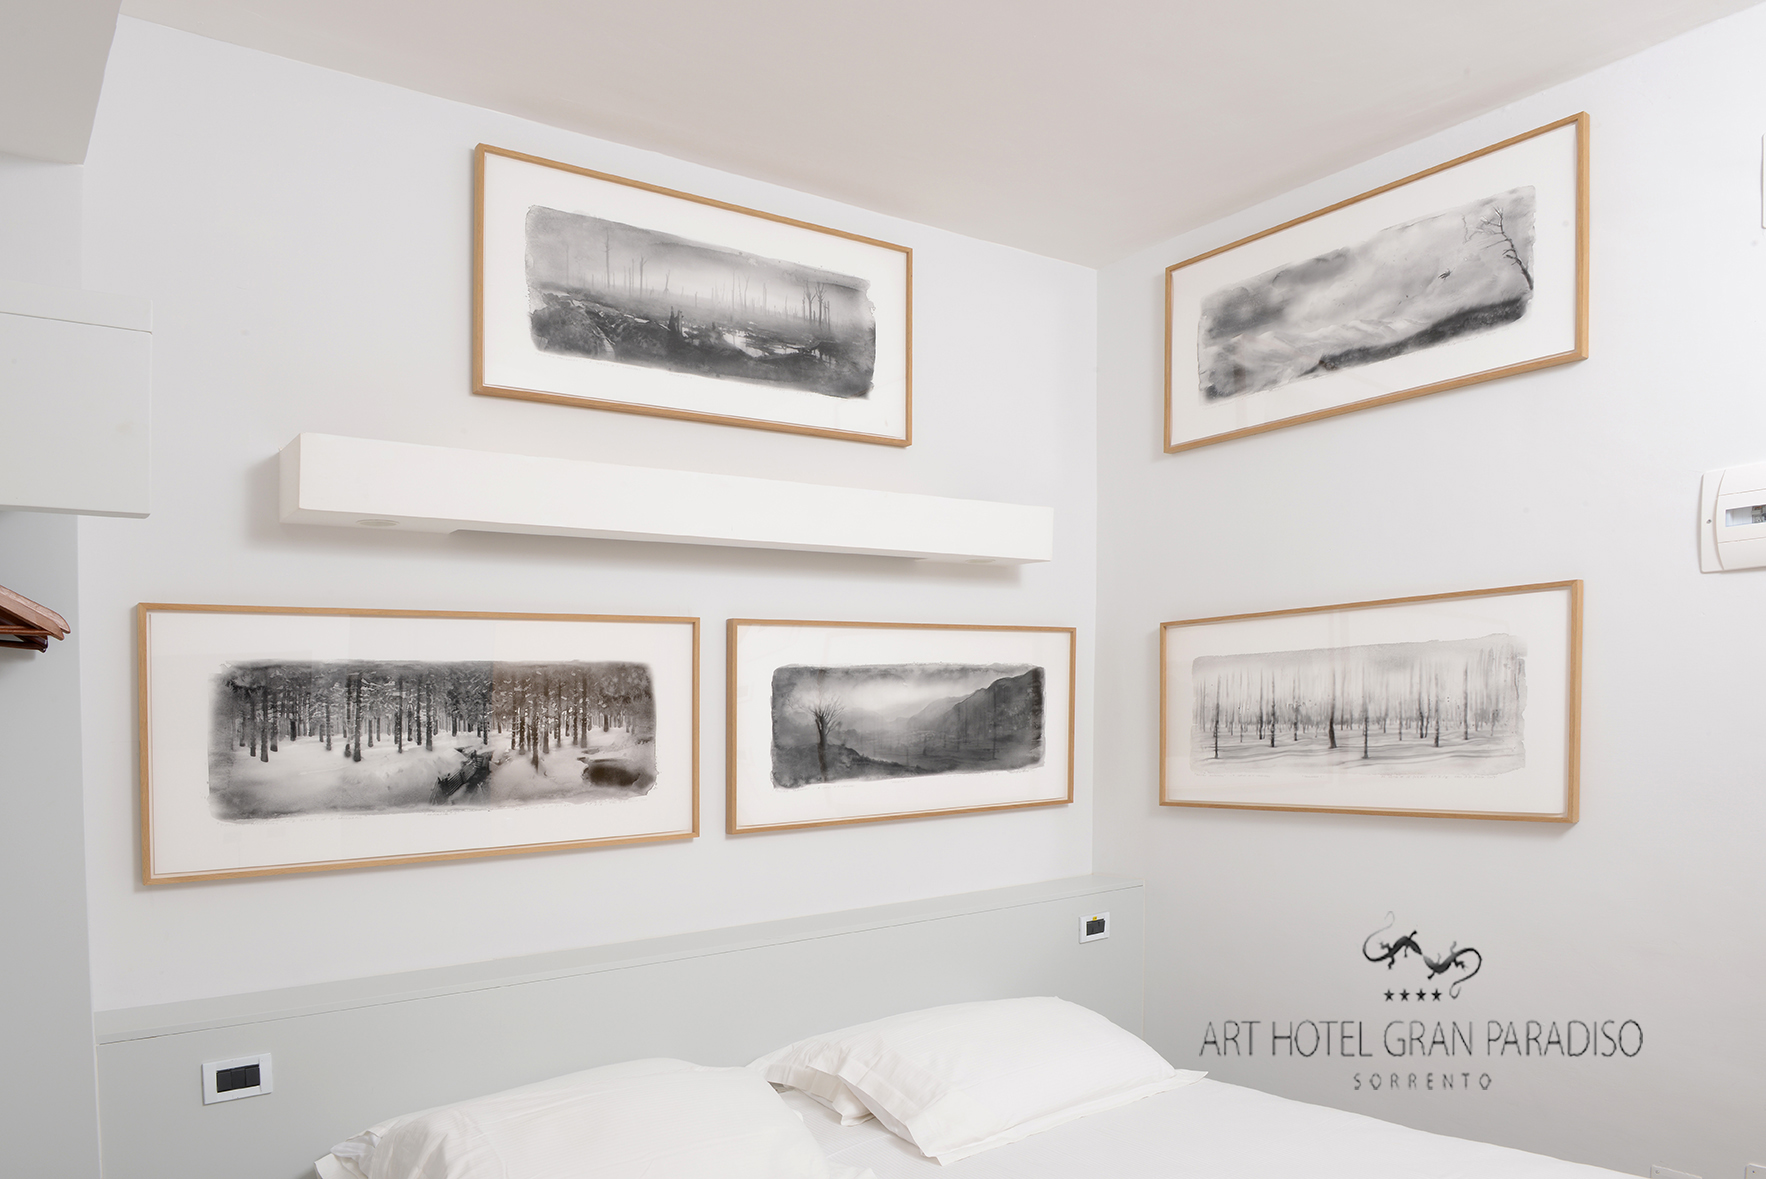 Art_Hotel_Gran_Paradiso_2013_409_Hans_Op_de_Beck_1.jpg